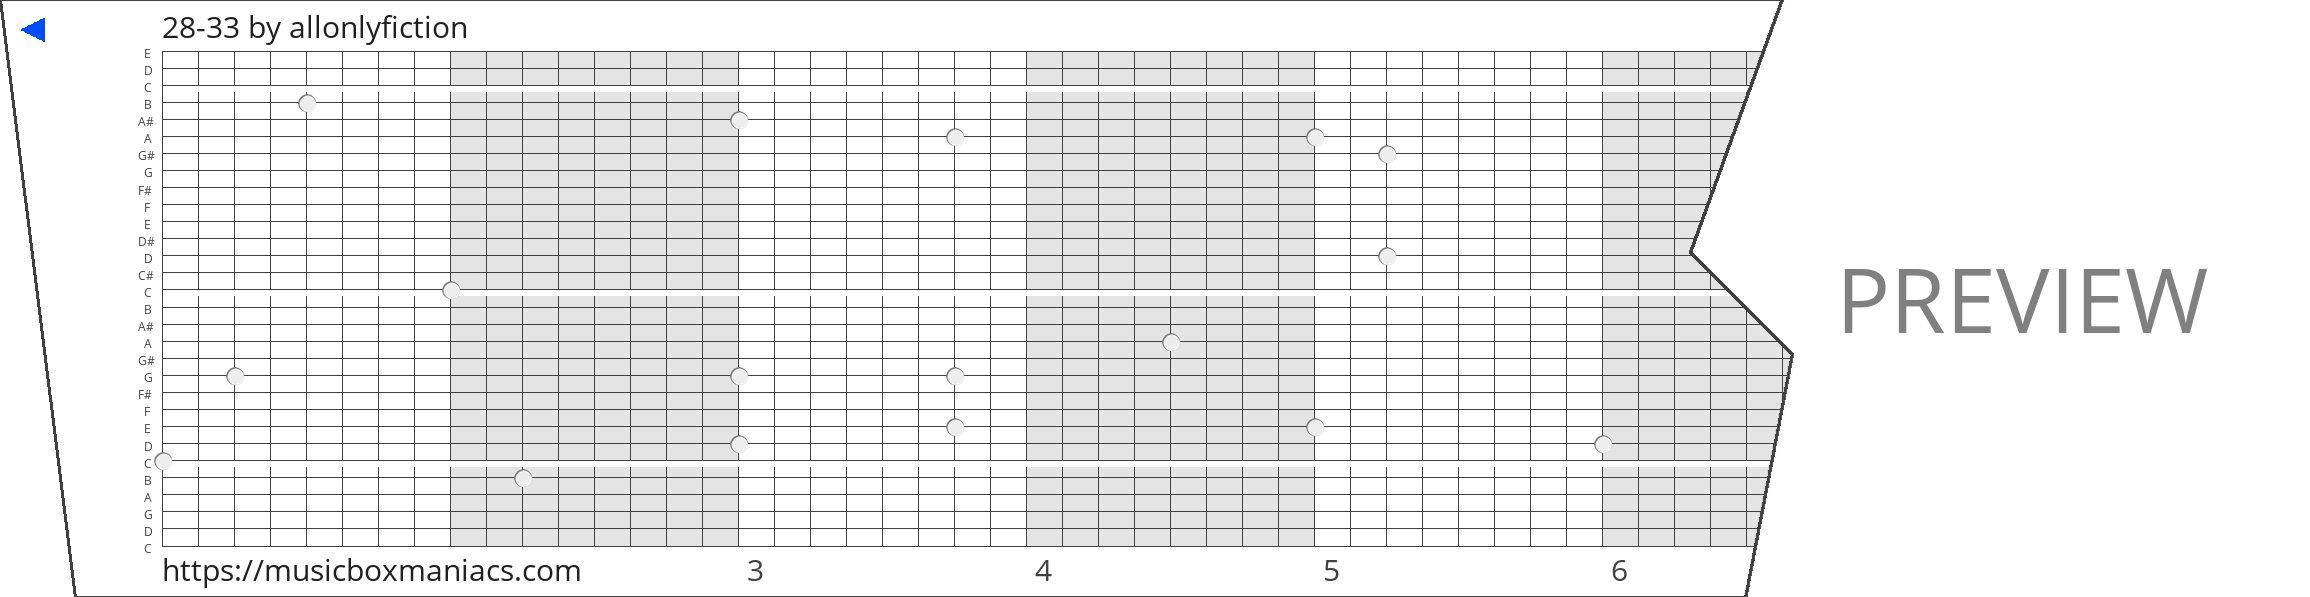 28-33 30 note music box paper strip